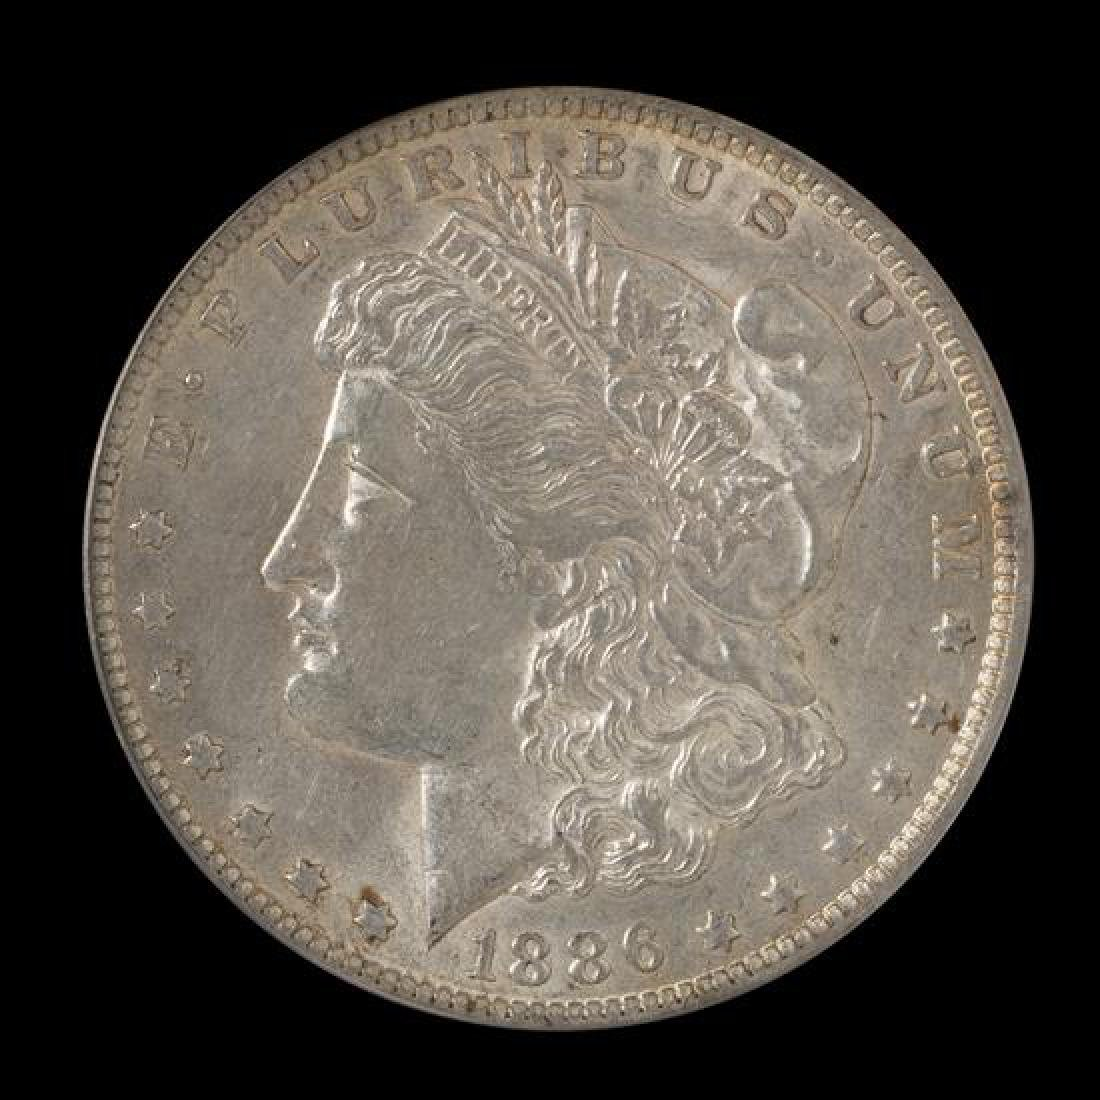 A United States 1886-O Morgan Silver Dollar Coin